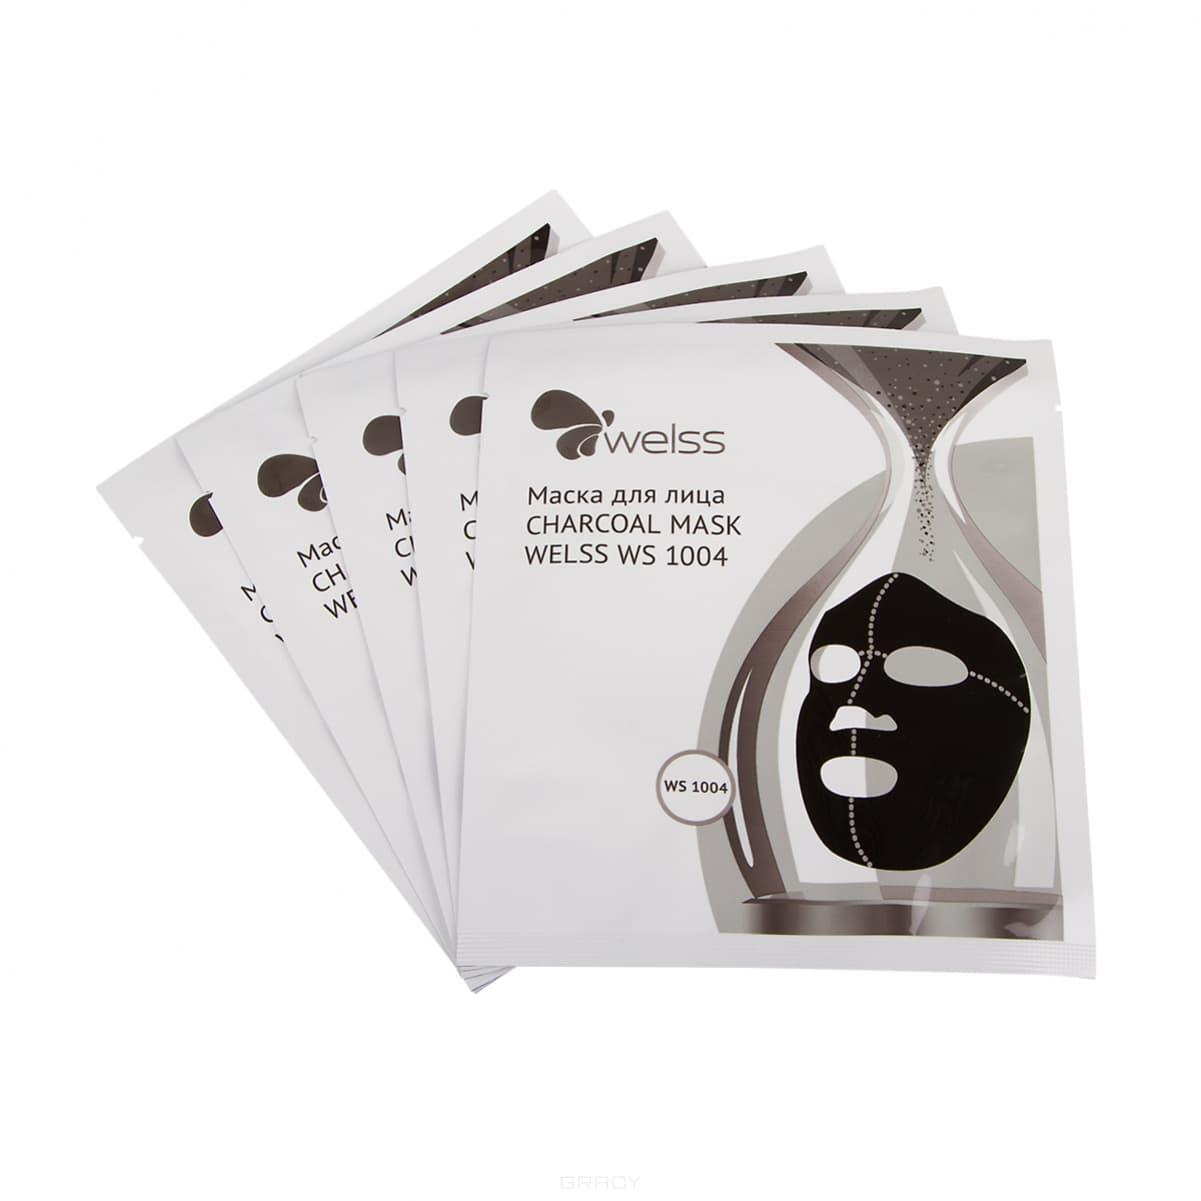 Welss Маска для лица Charcoal Mask, 5 шт/уп welss ws1003 сыворотка для лица секреты улитки 15 мл